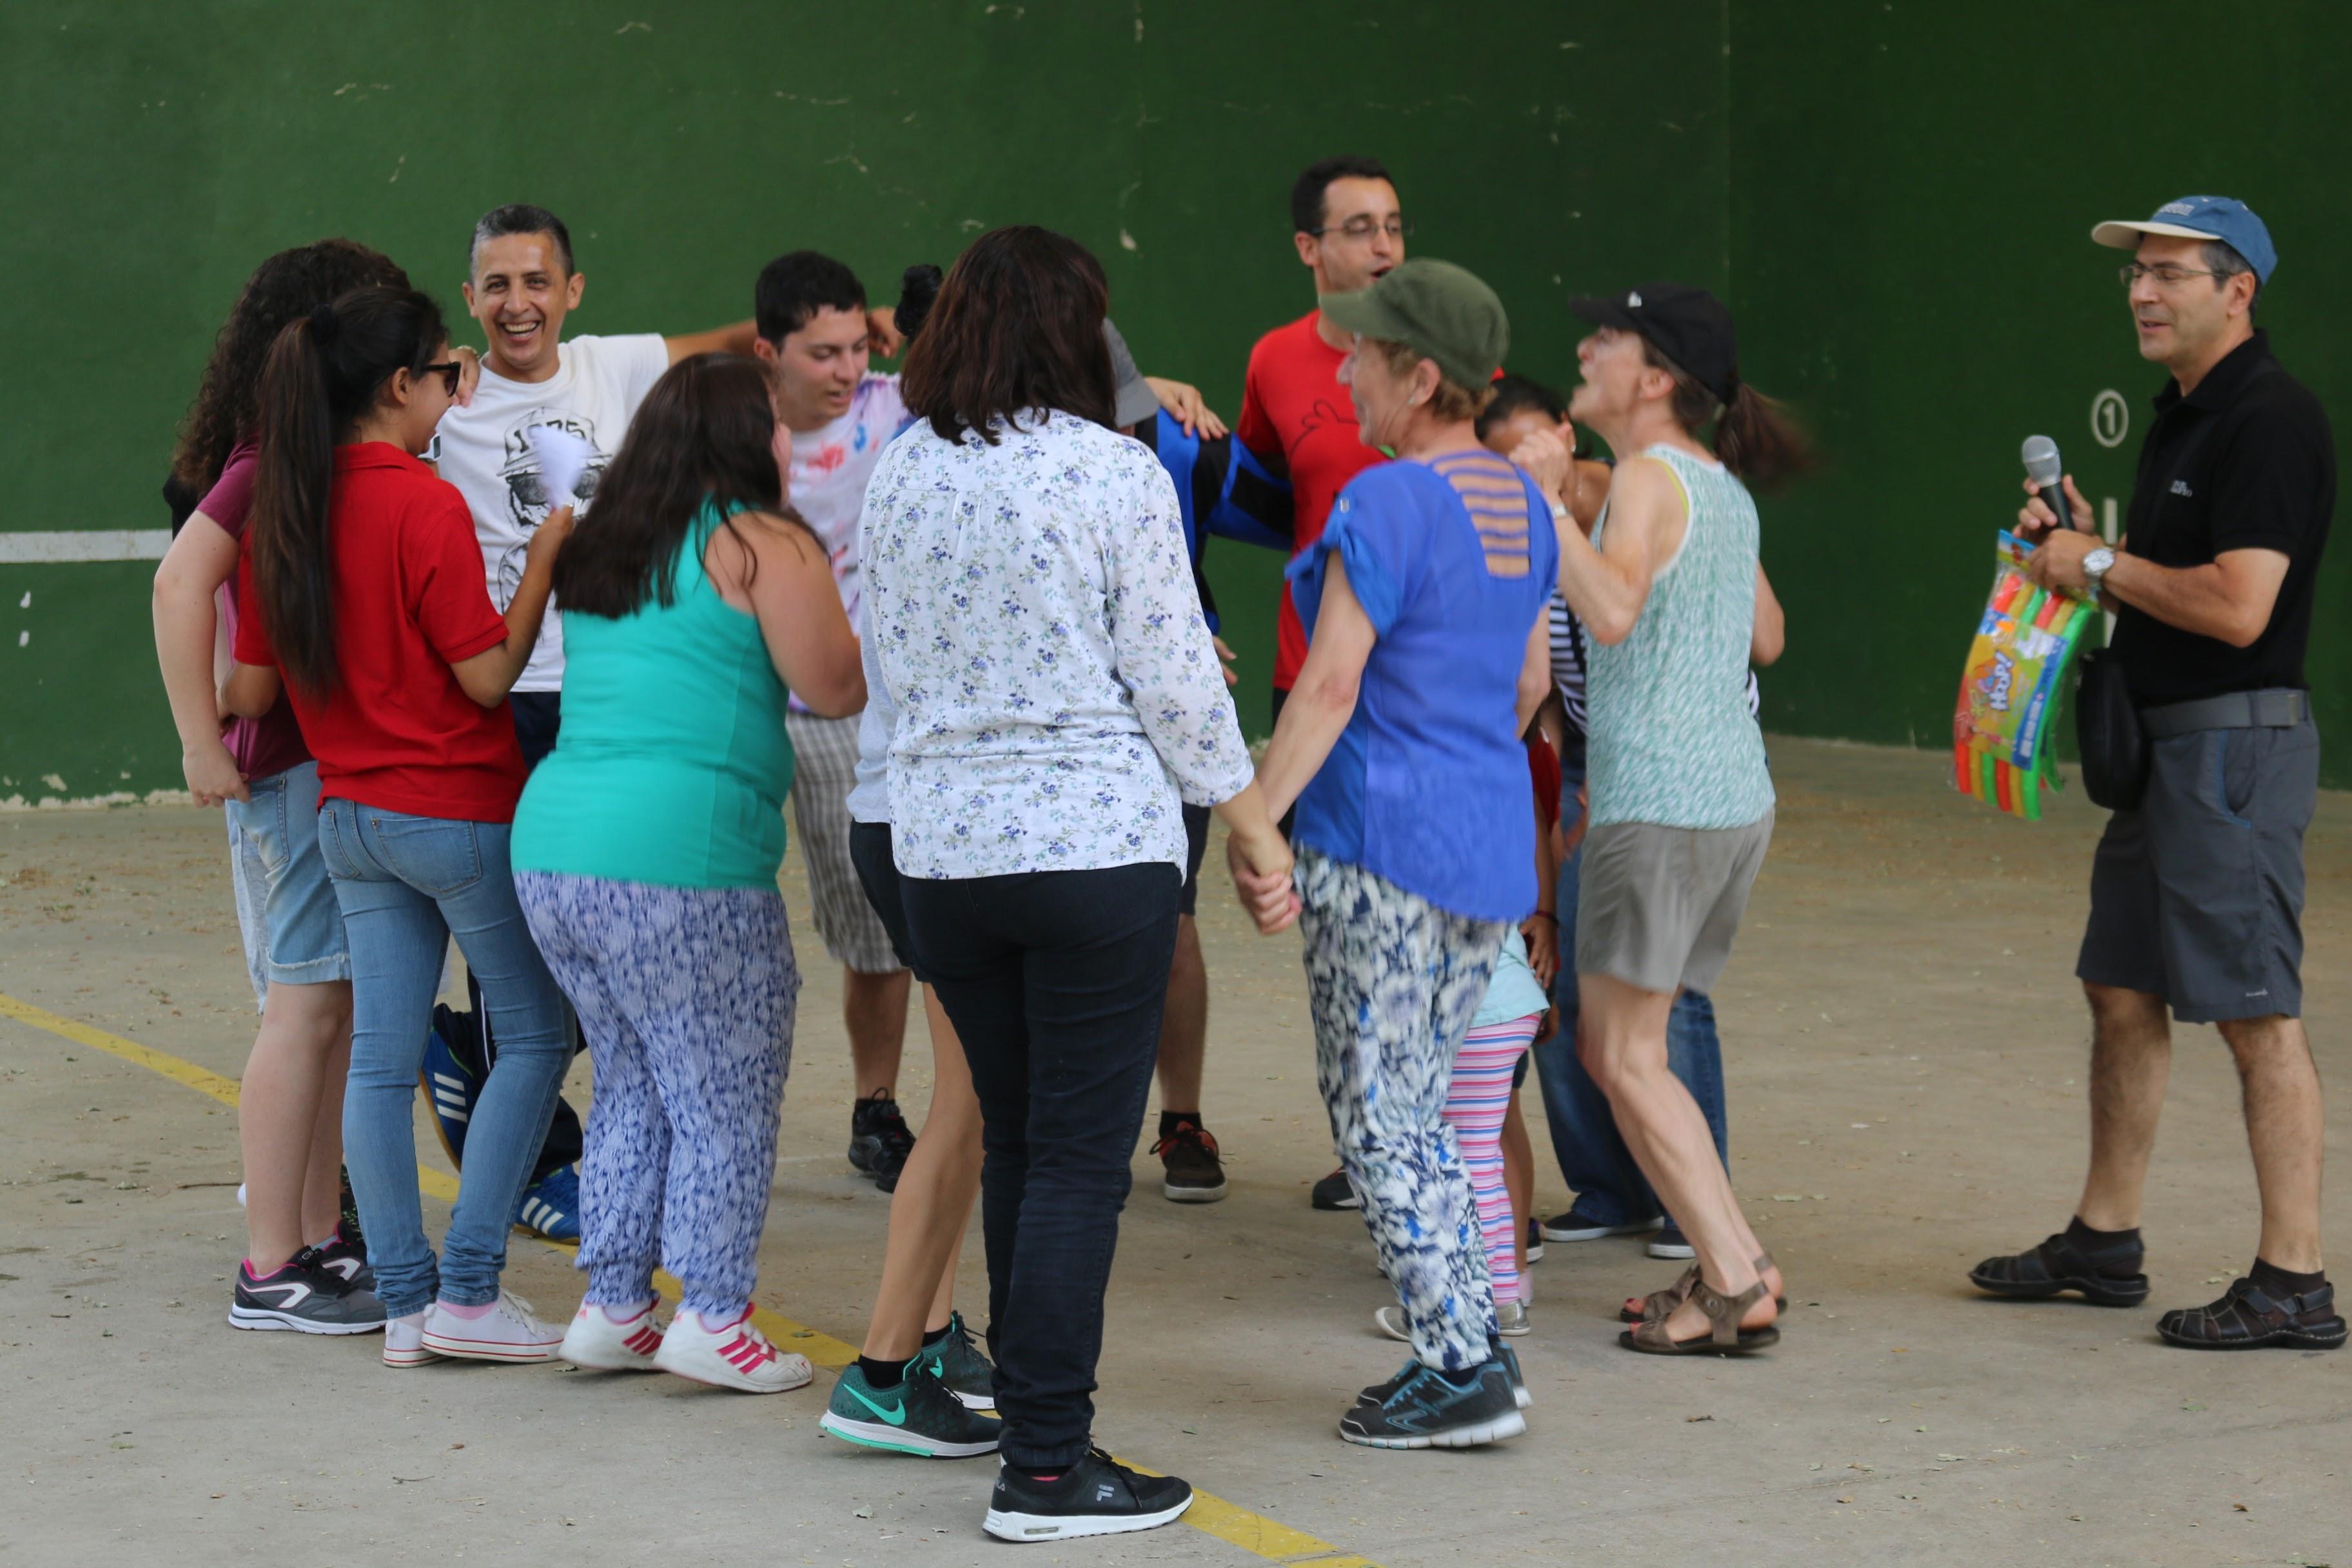 Picasa - Día de Campo SdJ 05.07.2015 (30).jpg